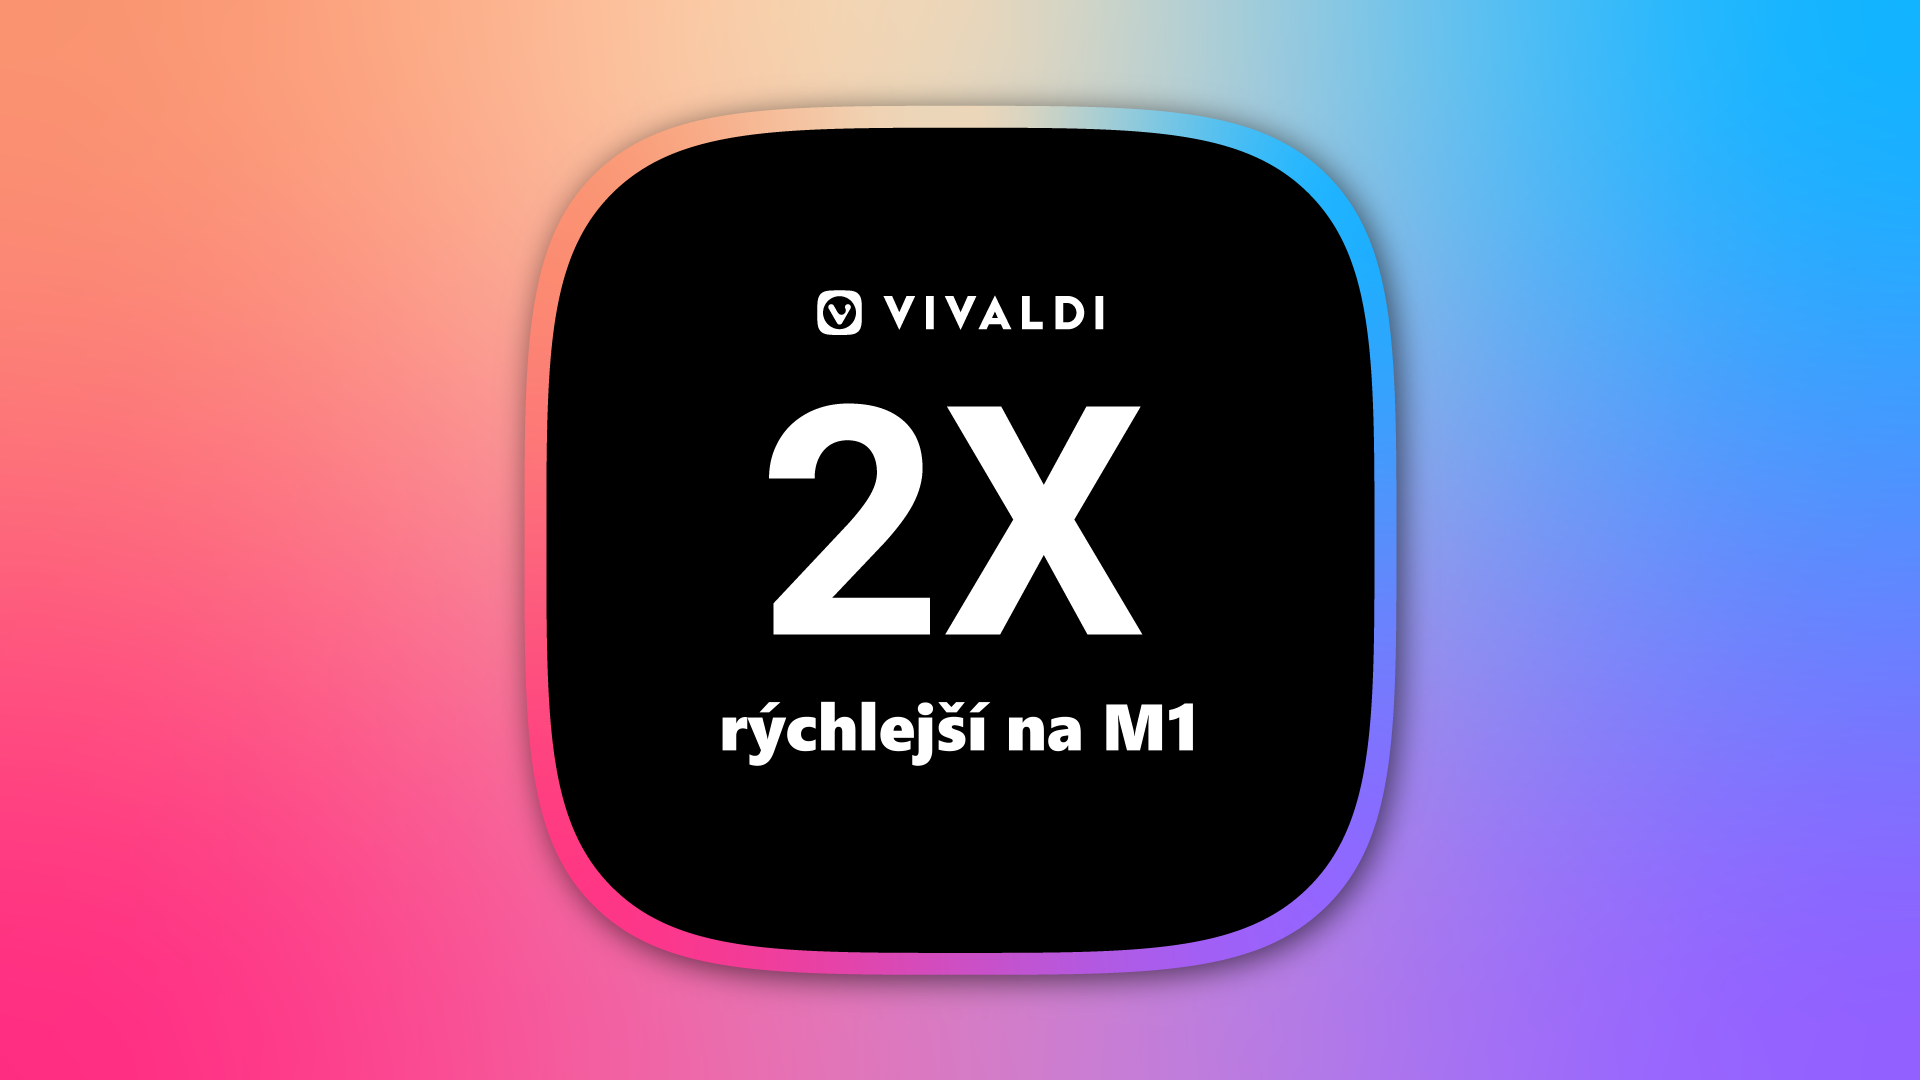 vivaldi browser apple